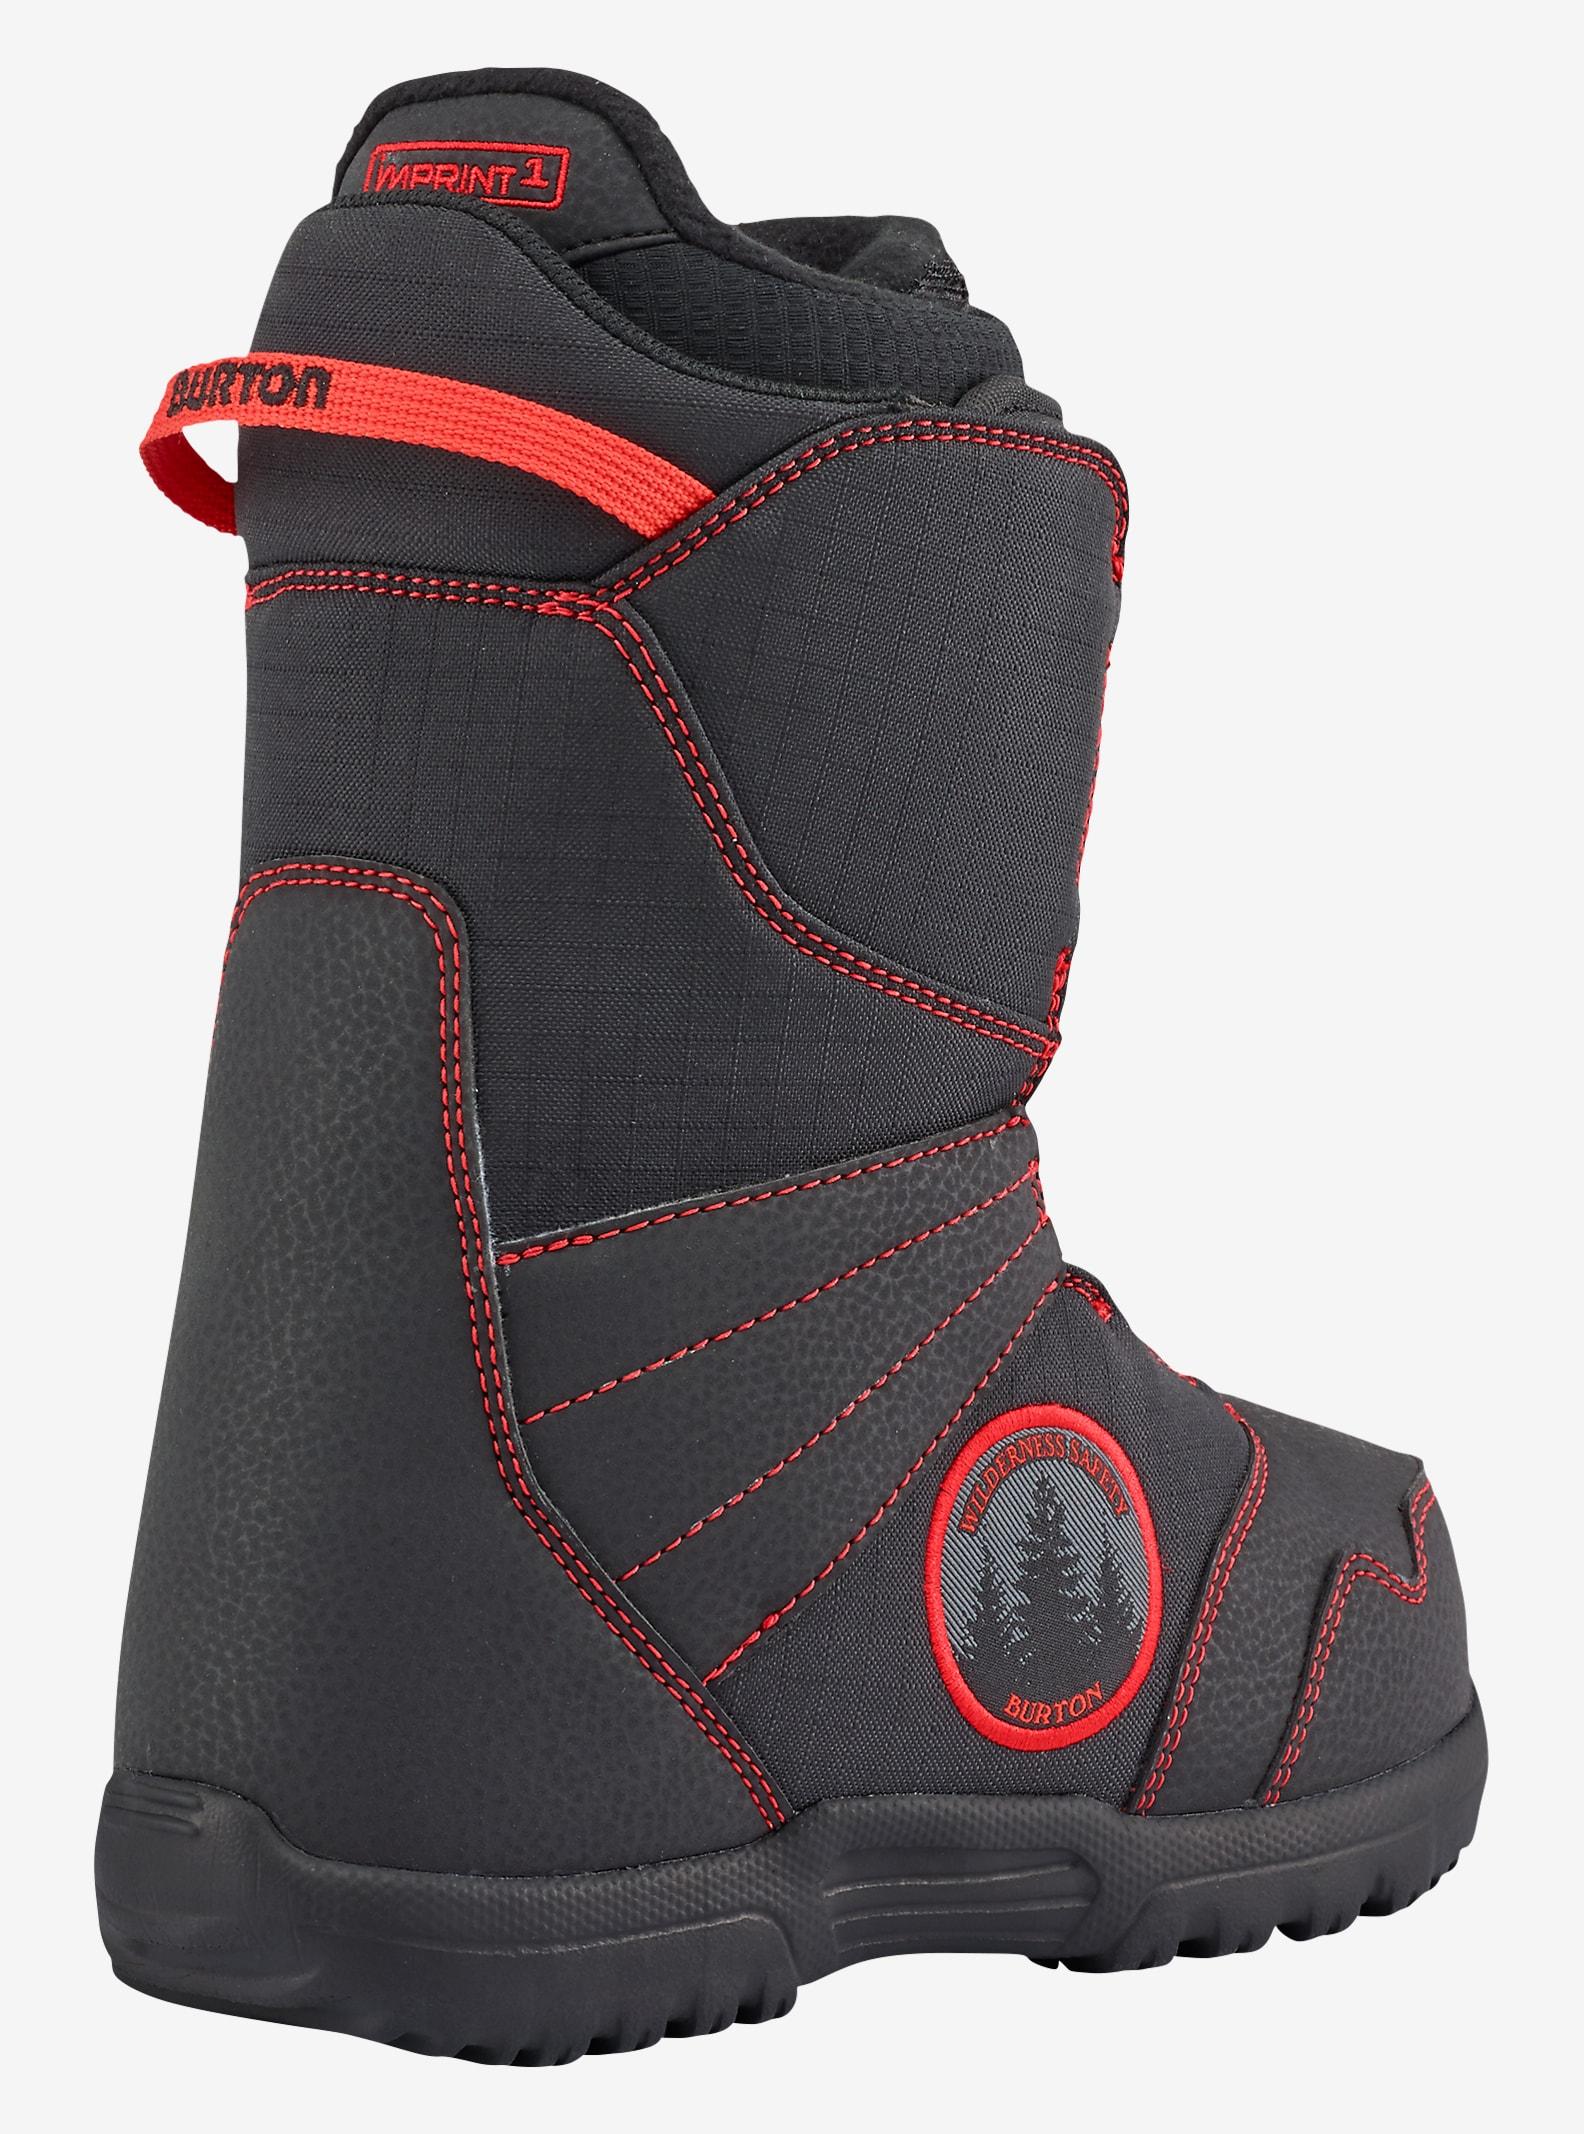 Burton Zipline Boa® Snowboard Boot shown in Black / Red